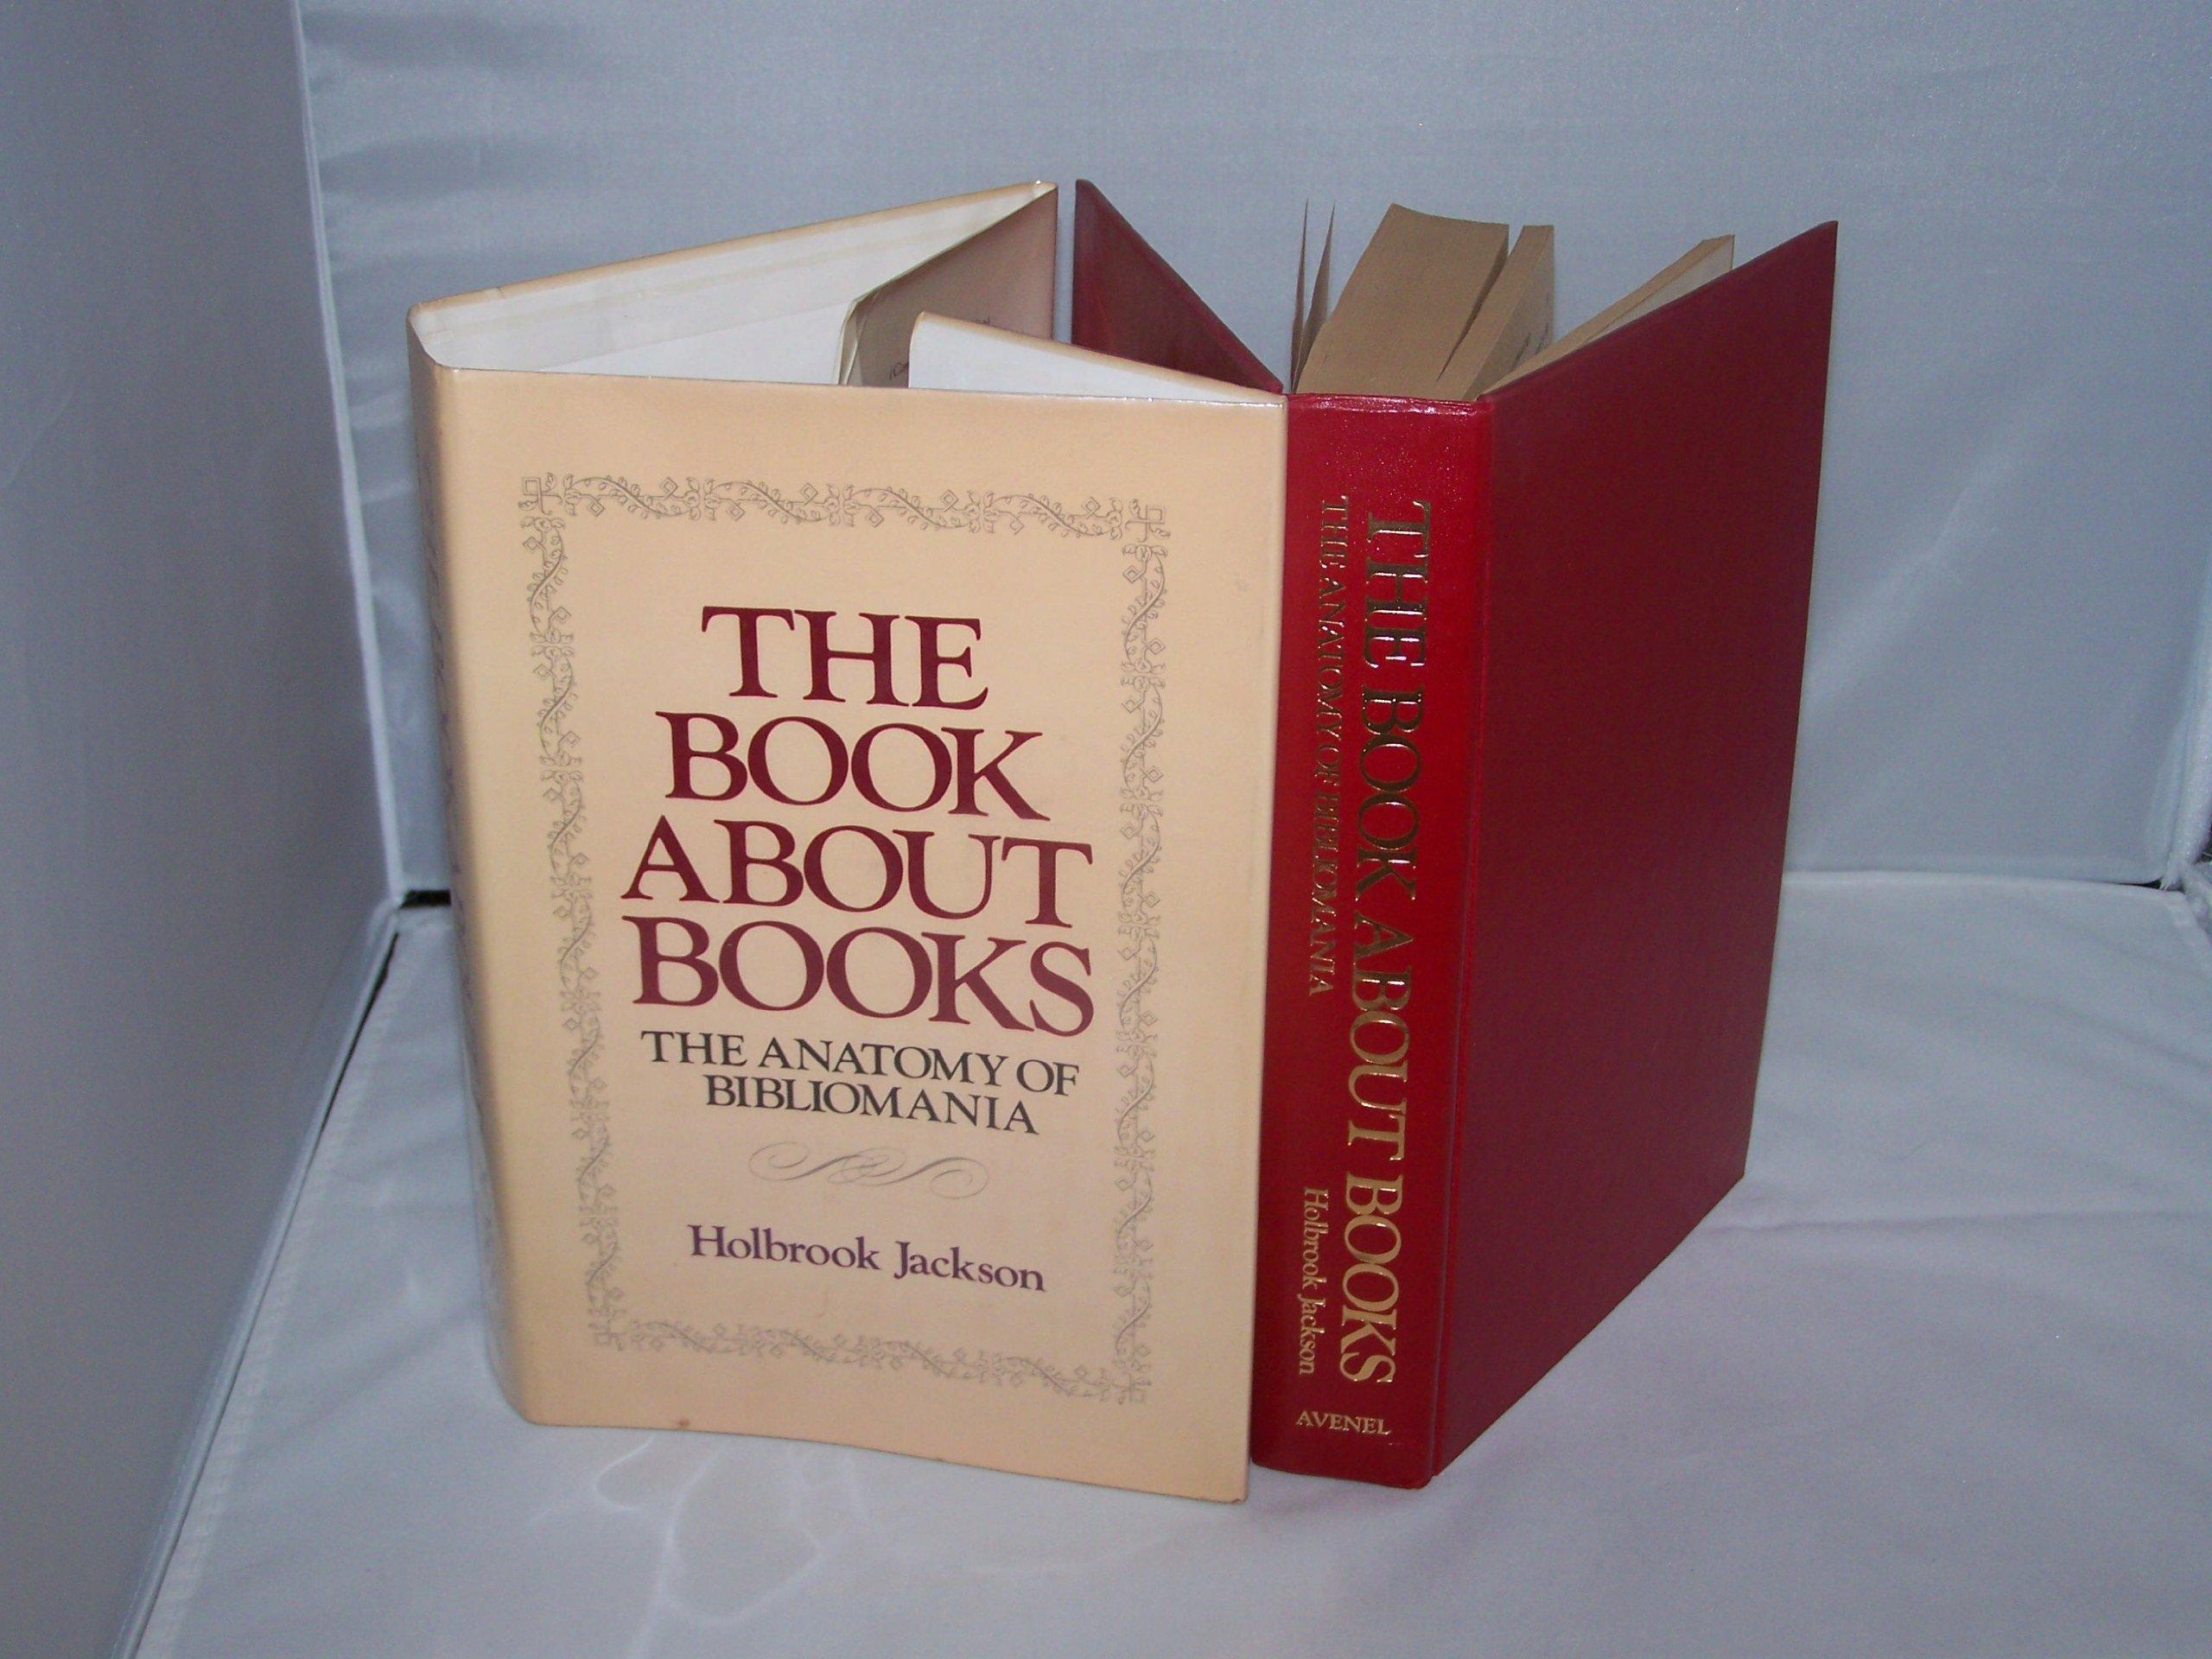 The Book About Books. The Anatomy of Bibliomania.: Holbrook Jackson ...